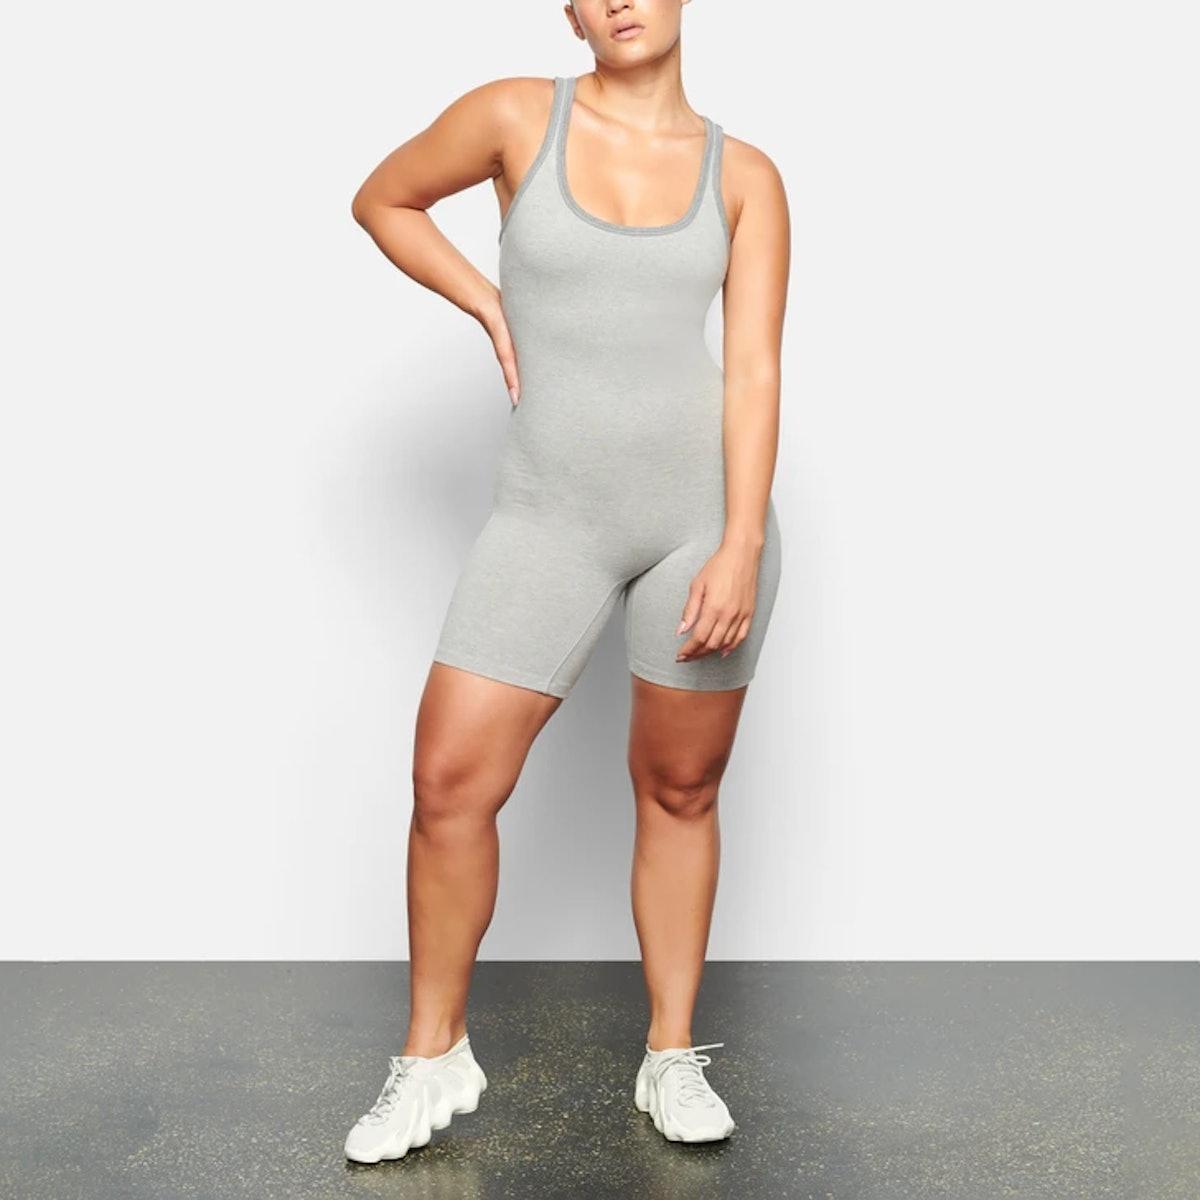 Mid Thigh Bodysuit